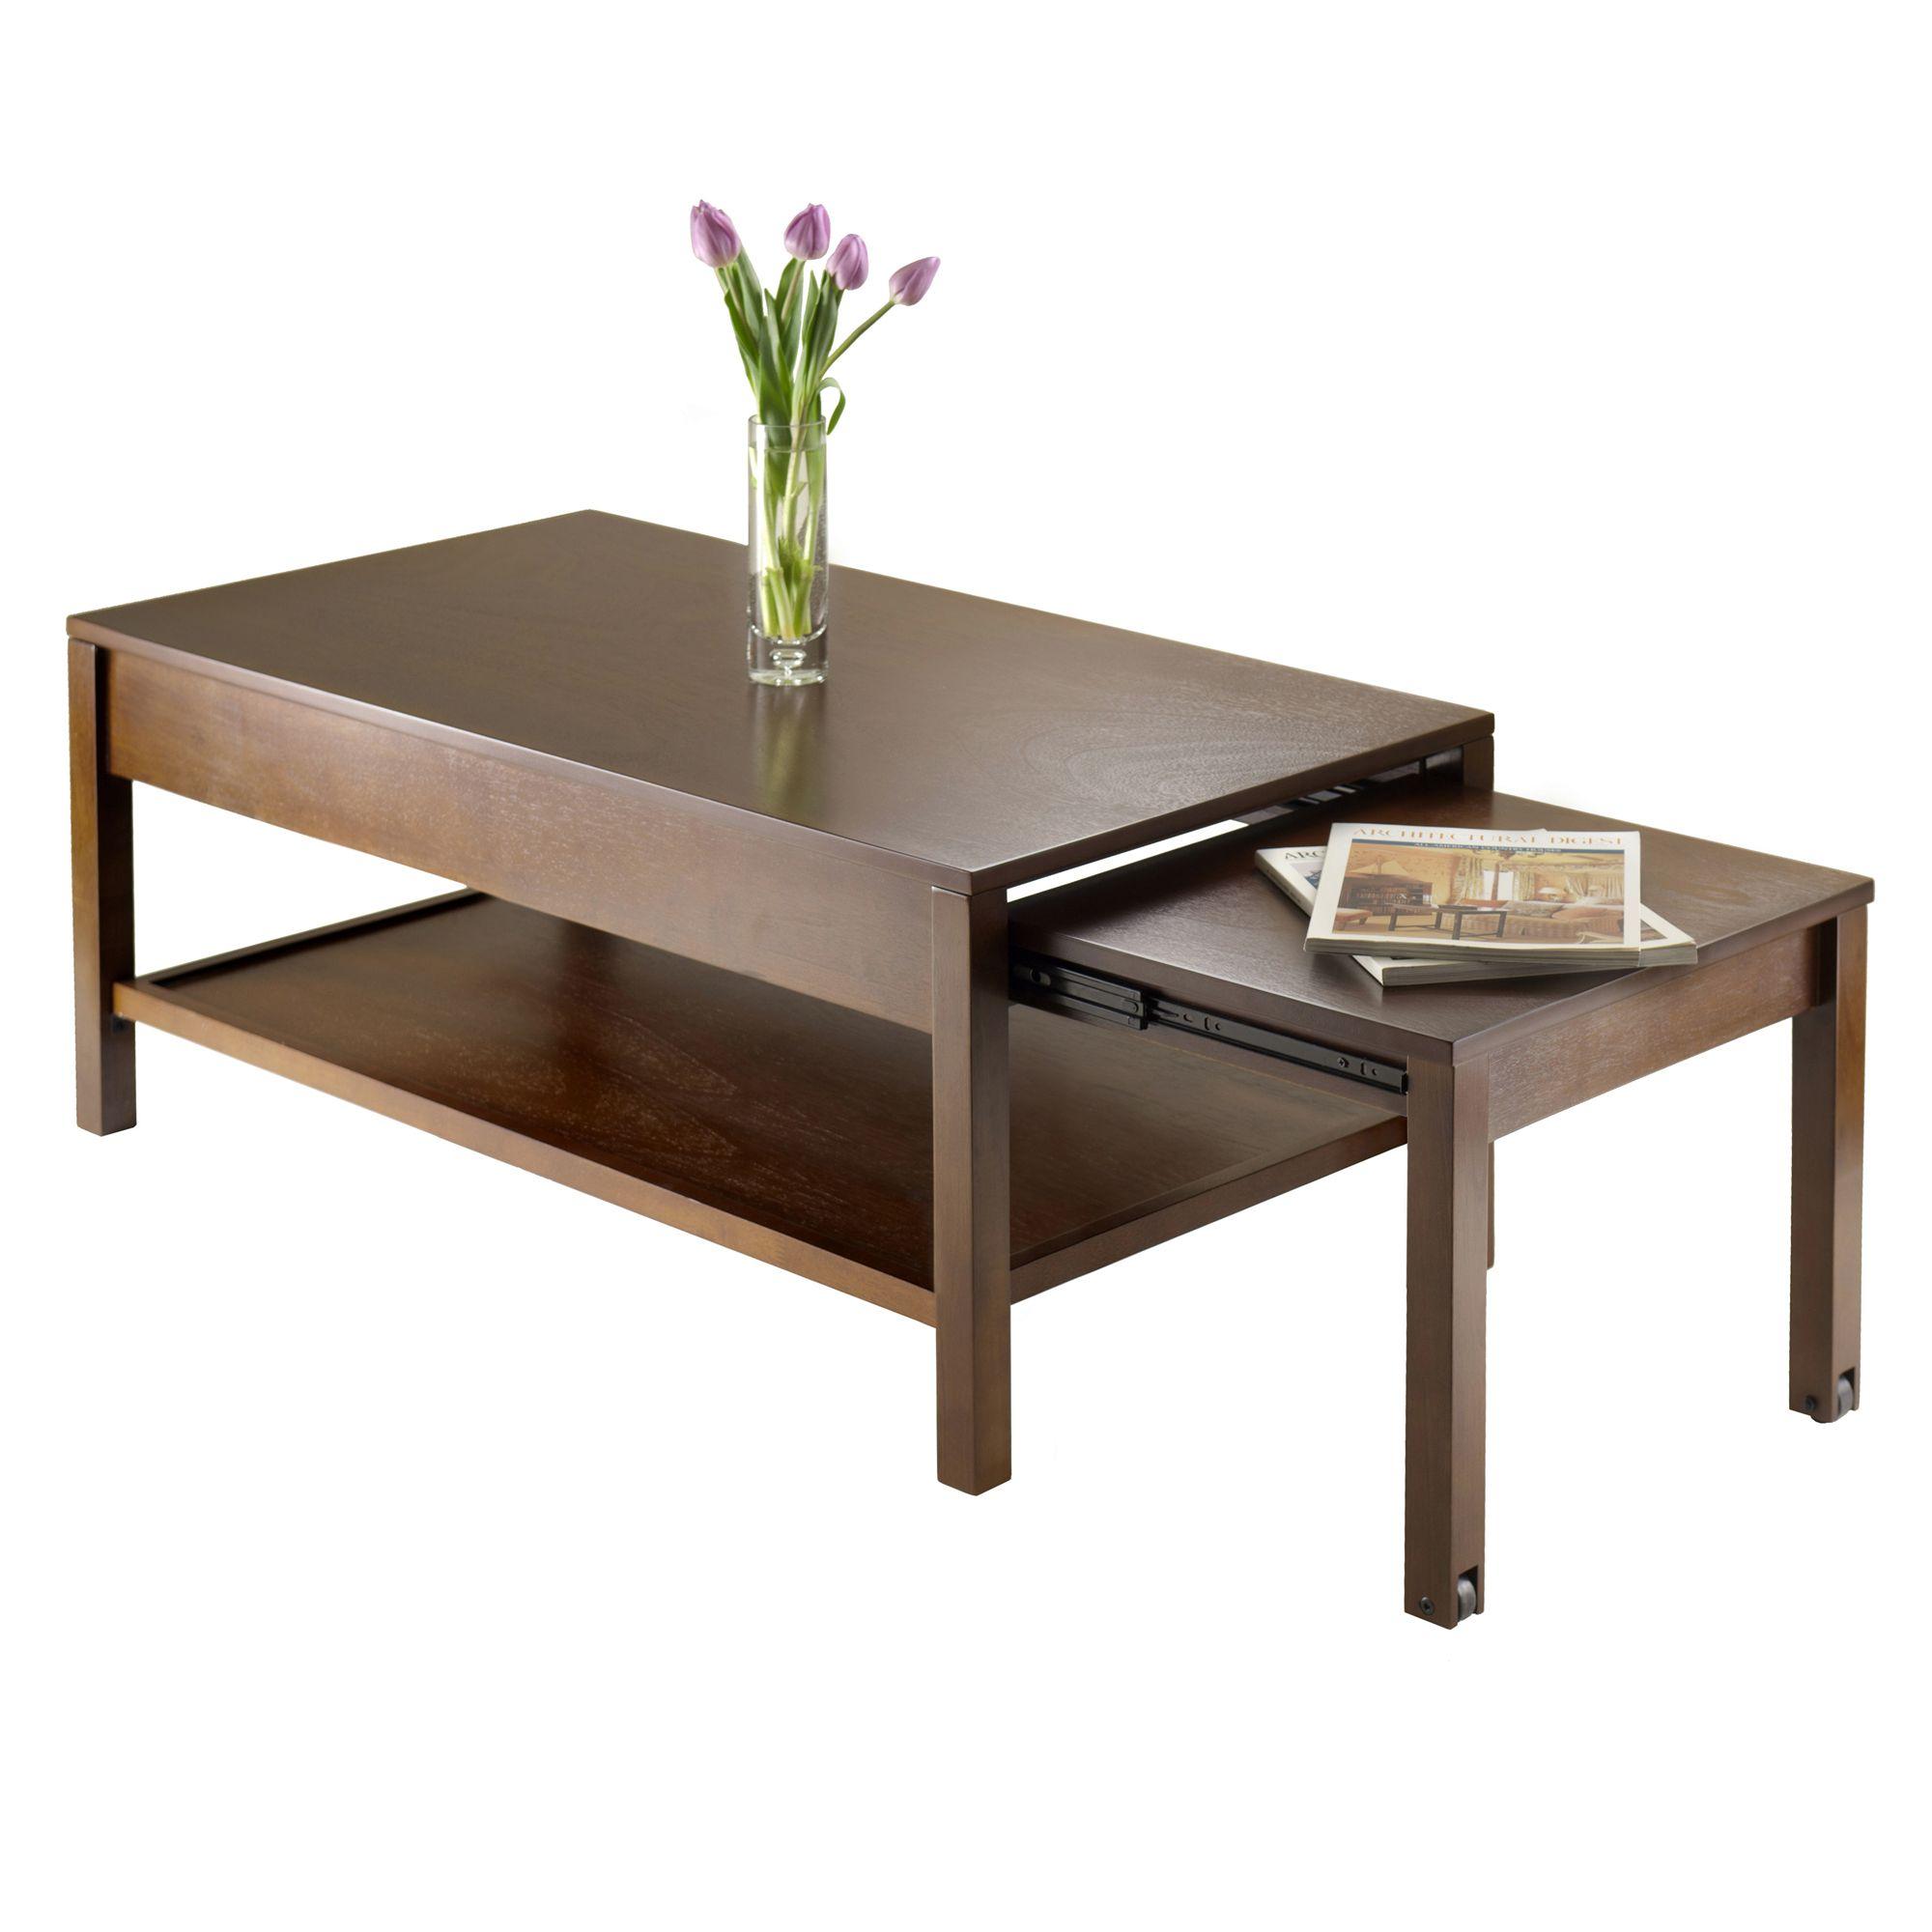 94856 Brandon Expandable Coffee Table, Living Room